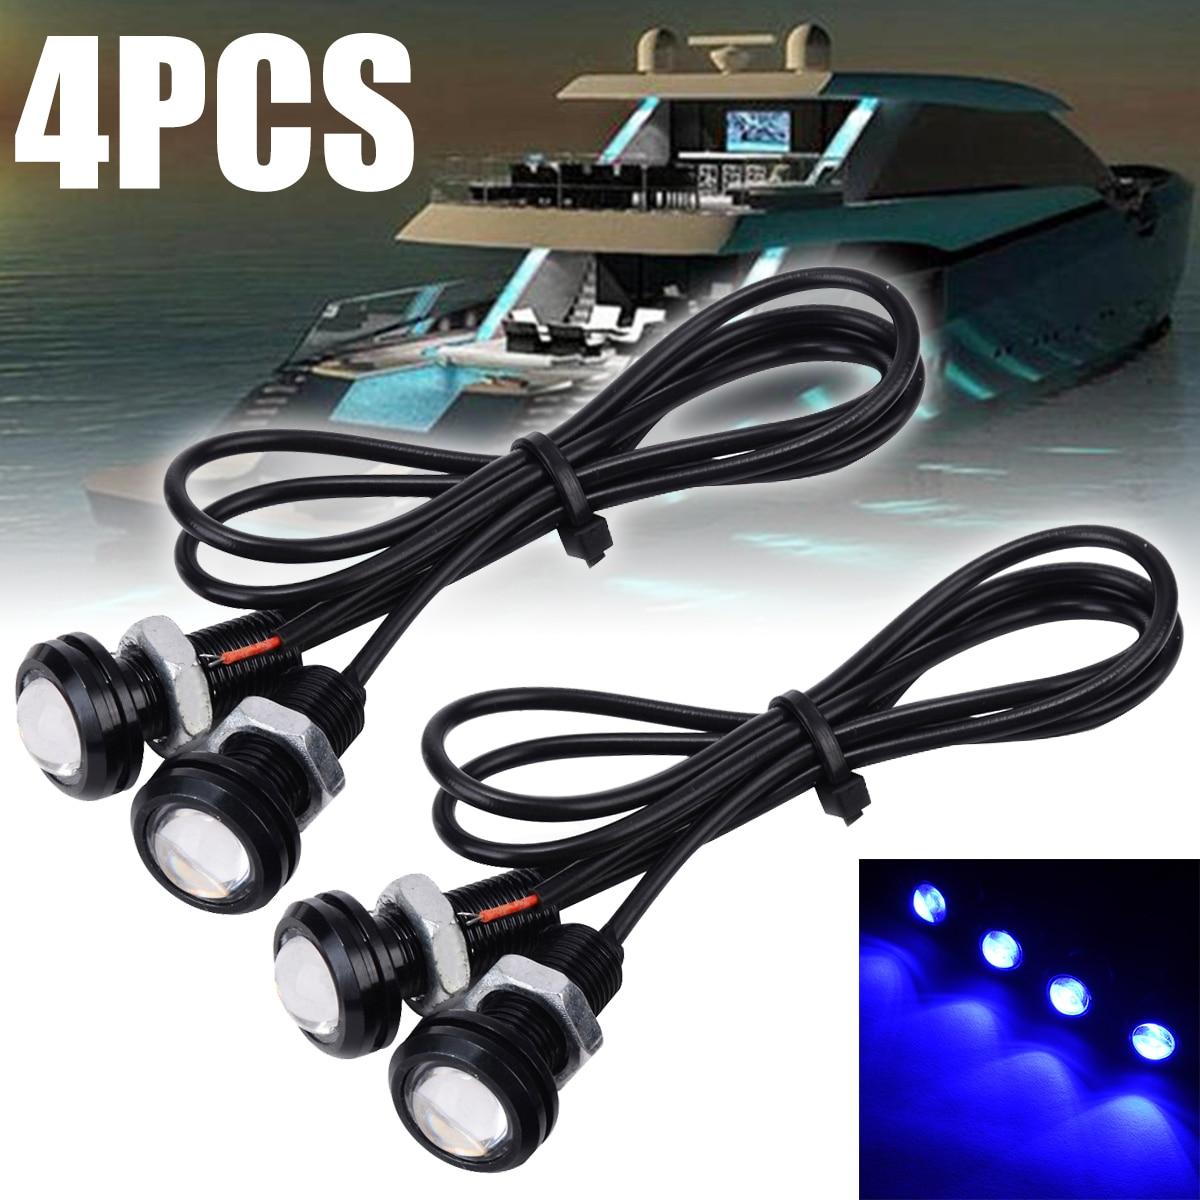 4Pcs/Set Blue LED Boat Plug Light Waterproof Marine Underwater Fish Boat Light Parts Accessories Universal